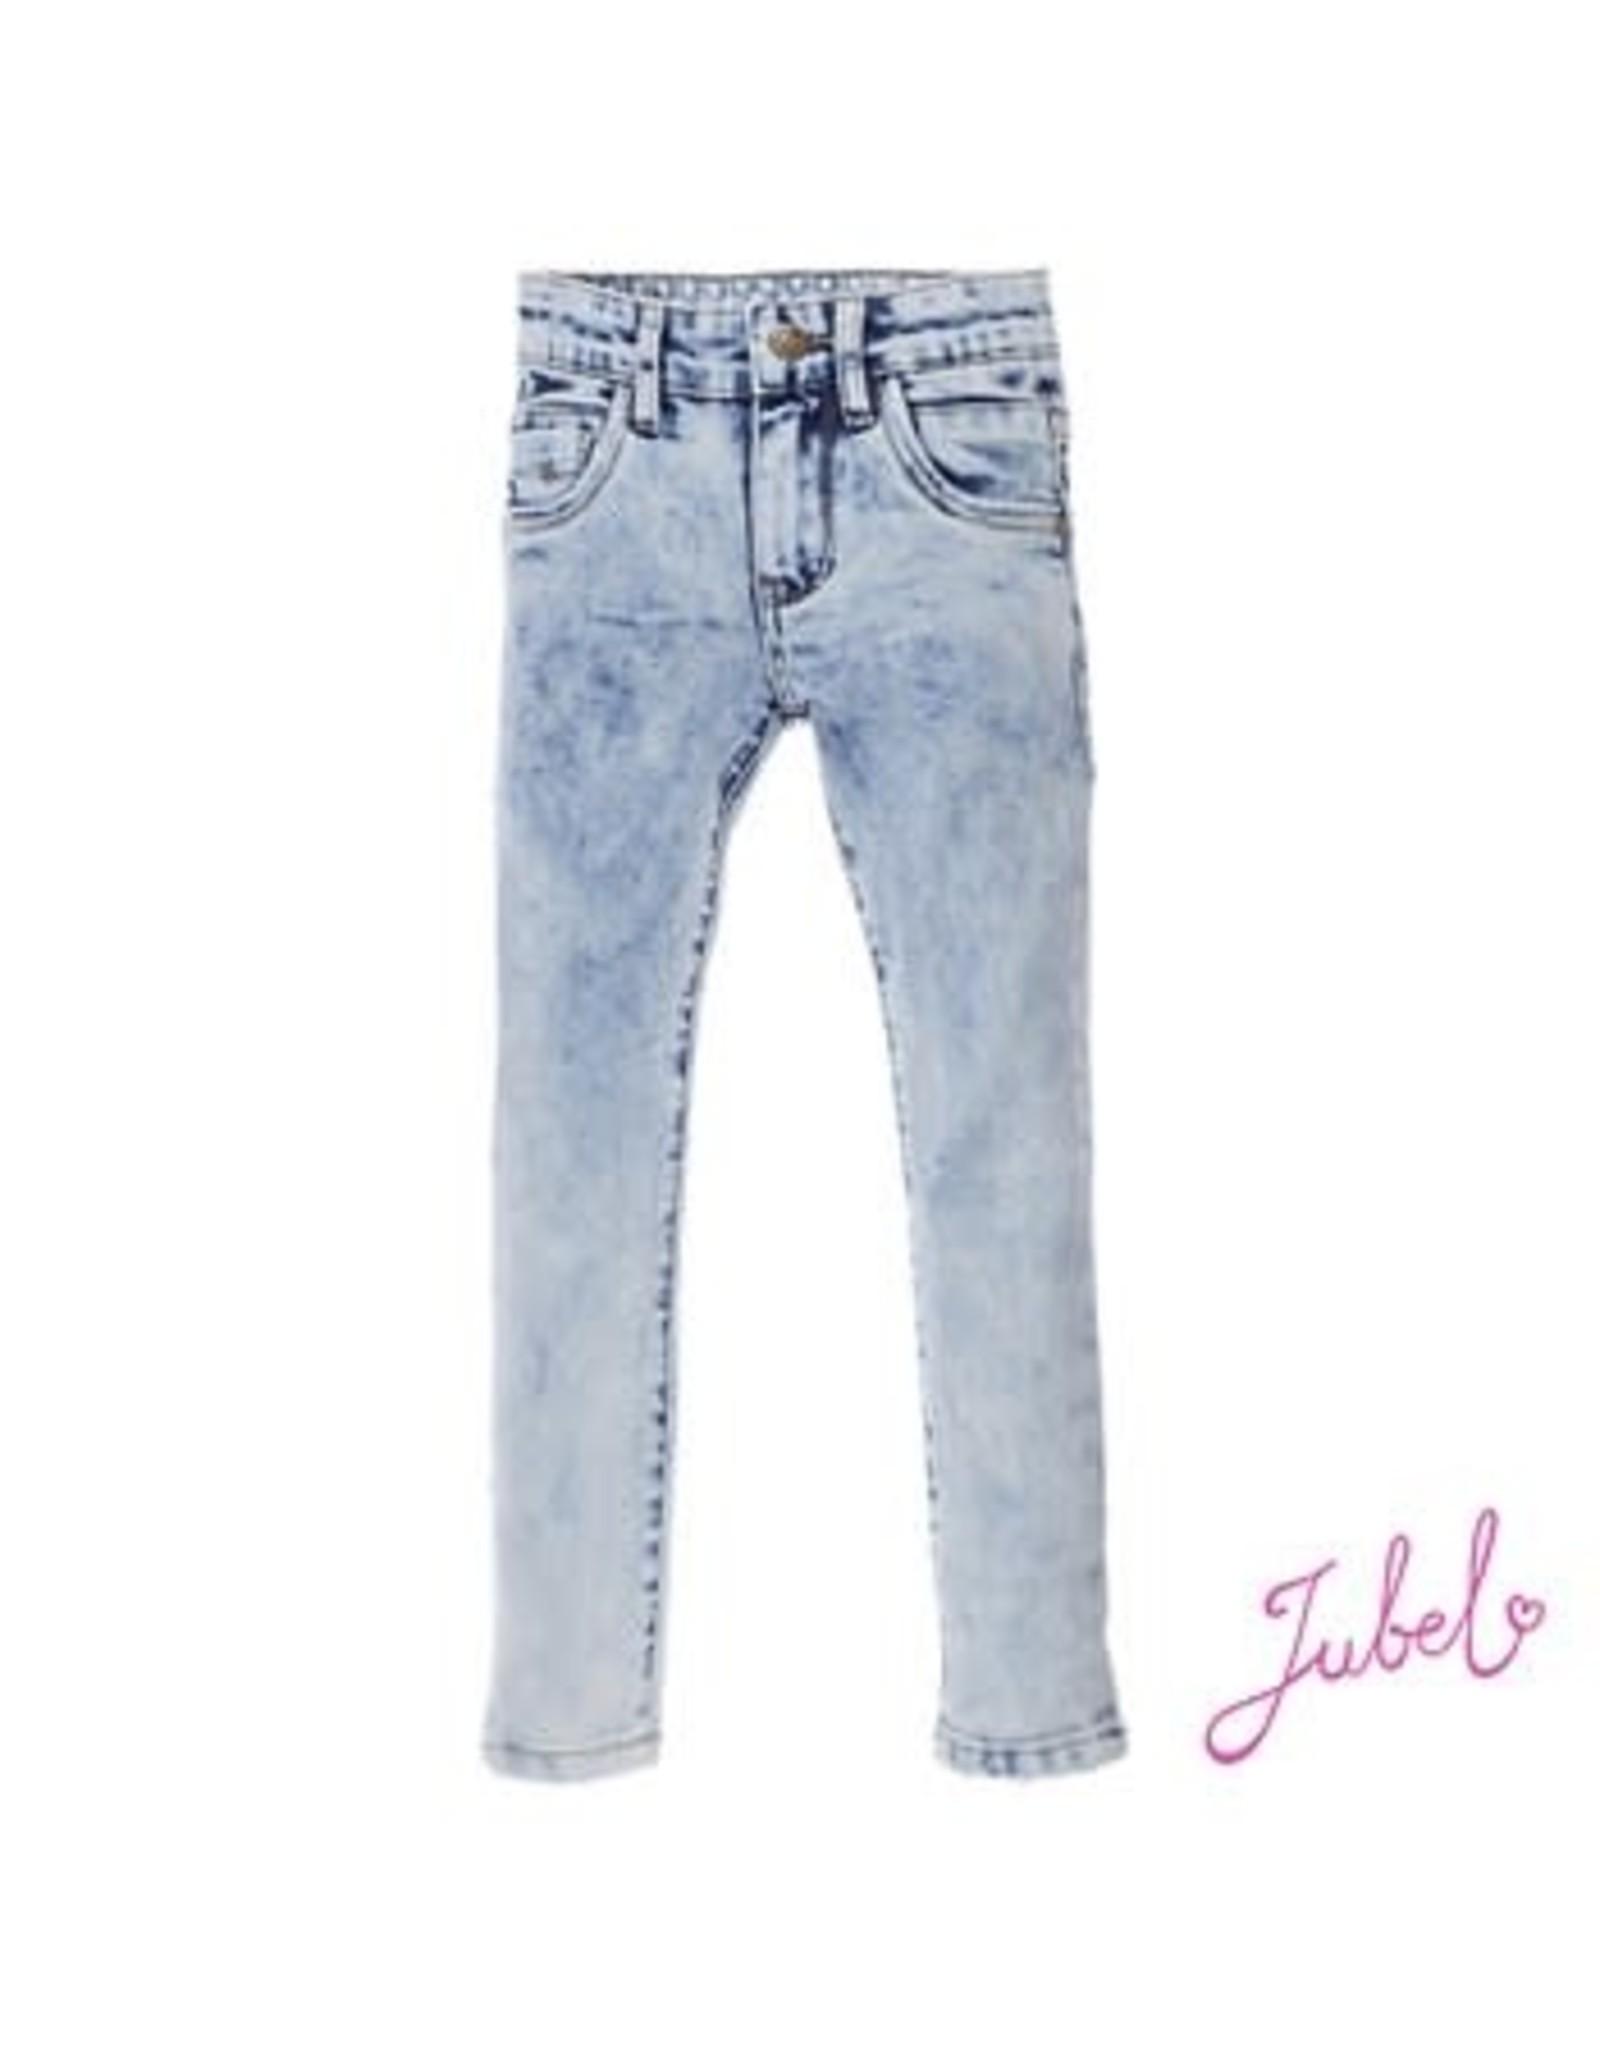 Jubel jeans